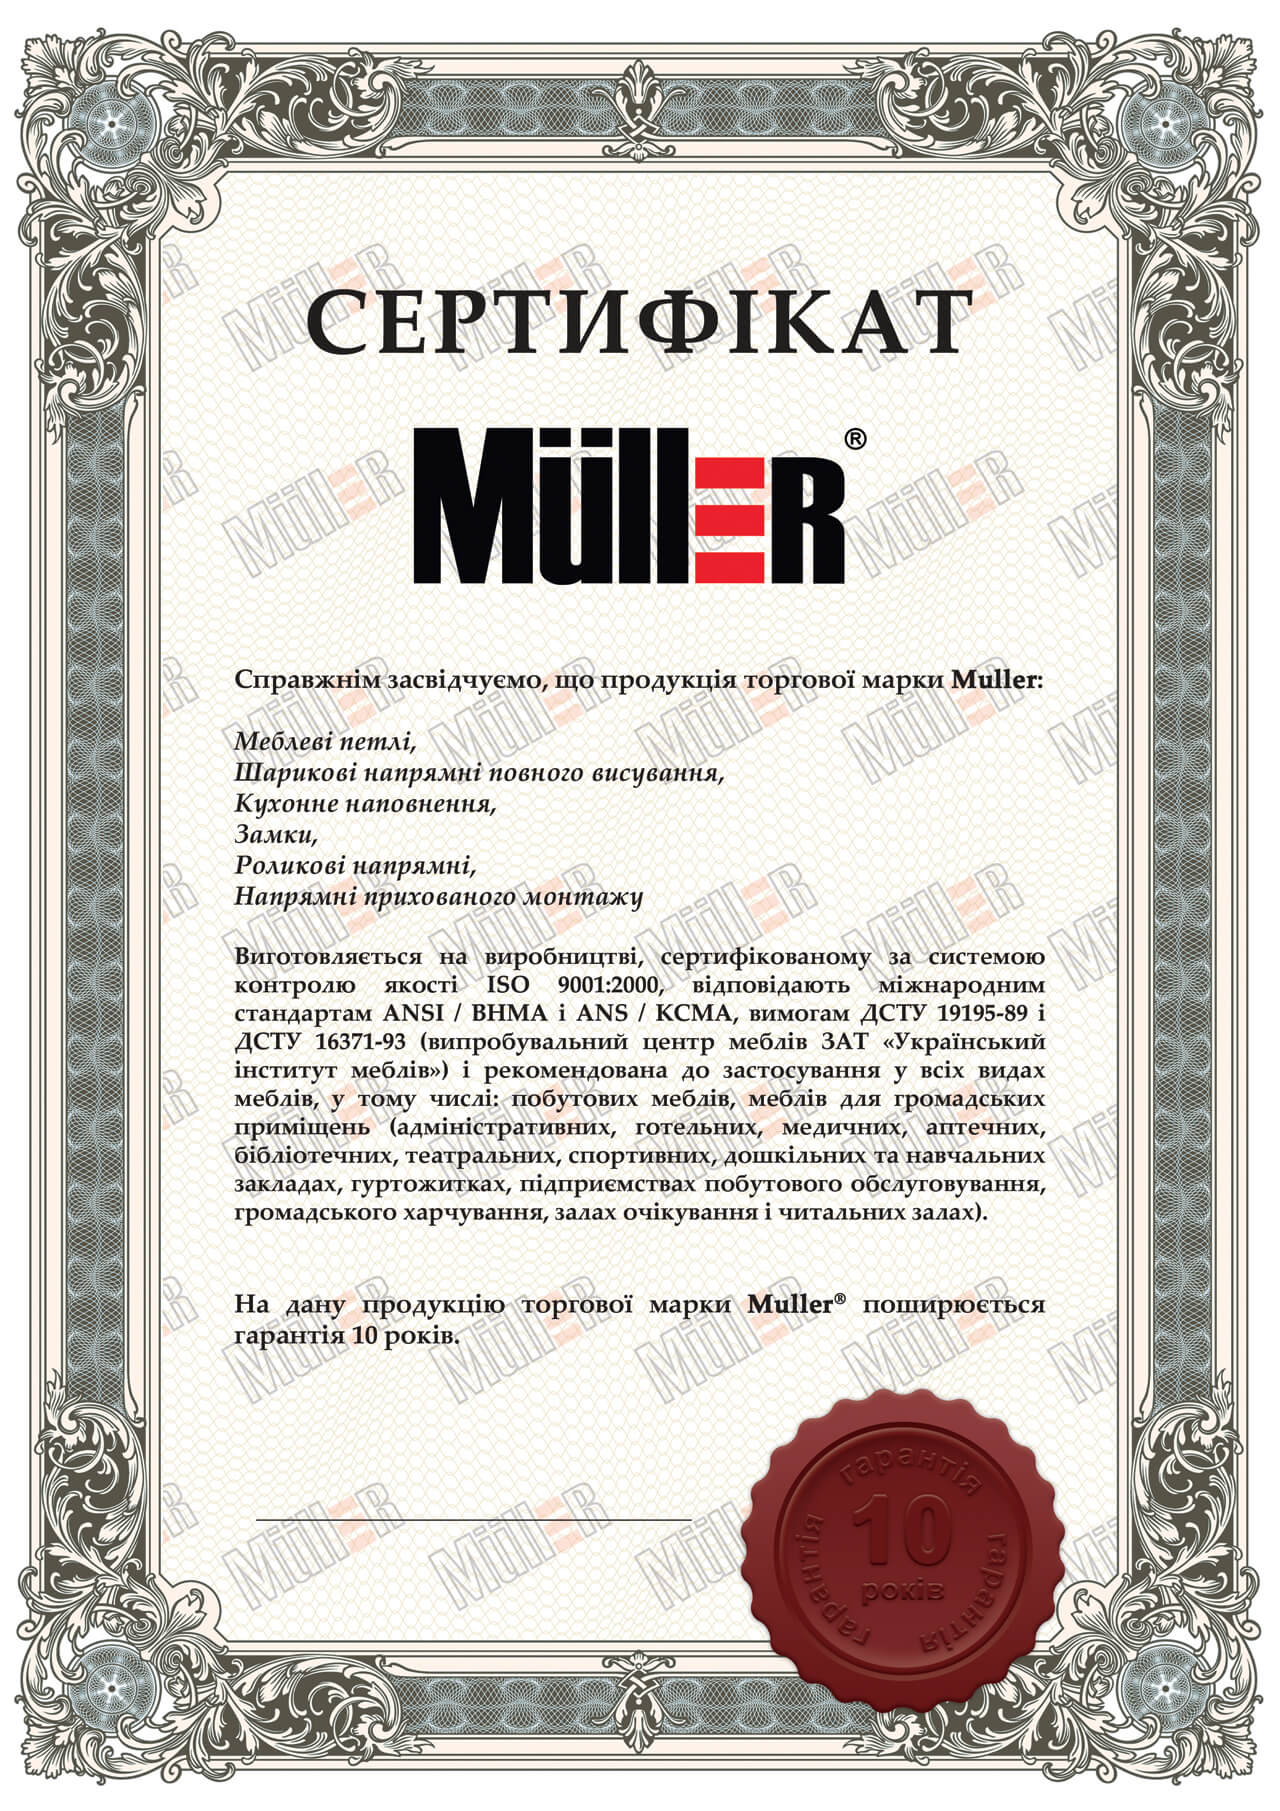 Cертификат Muller